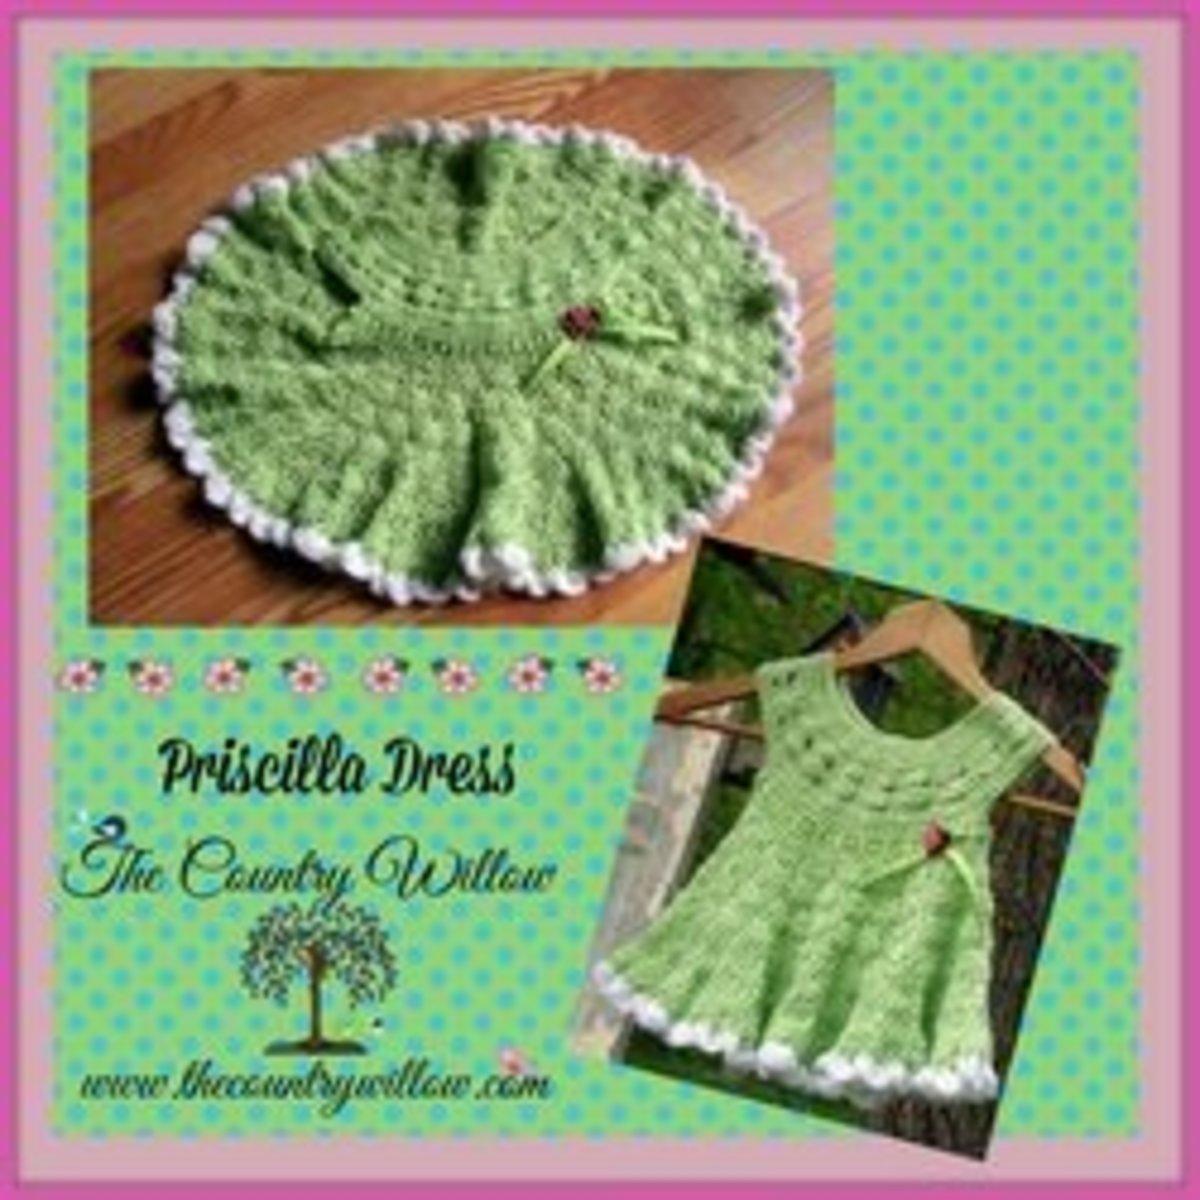 Free Crochet Patterns for Baby Dresses FeltMagnet